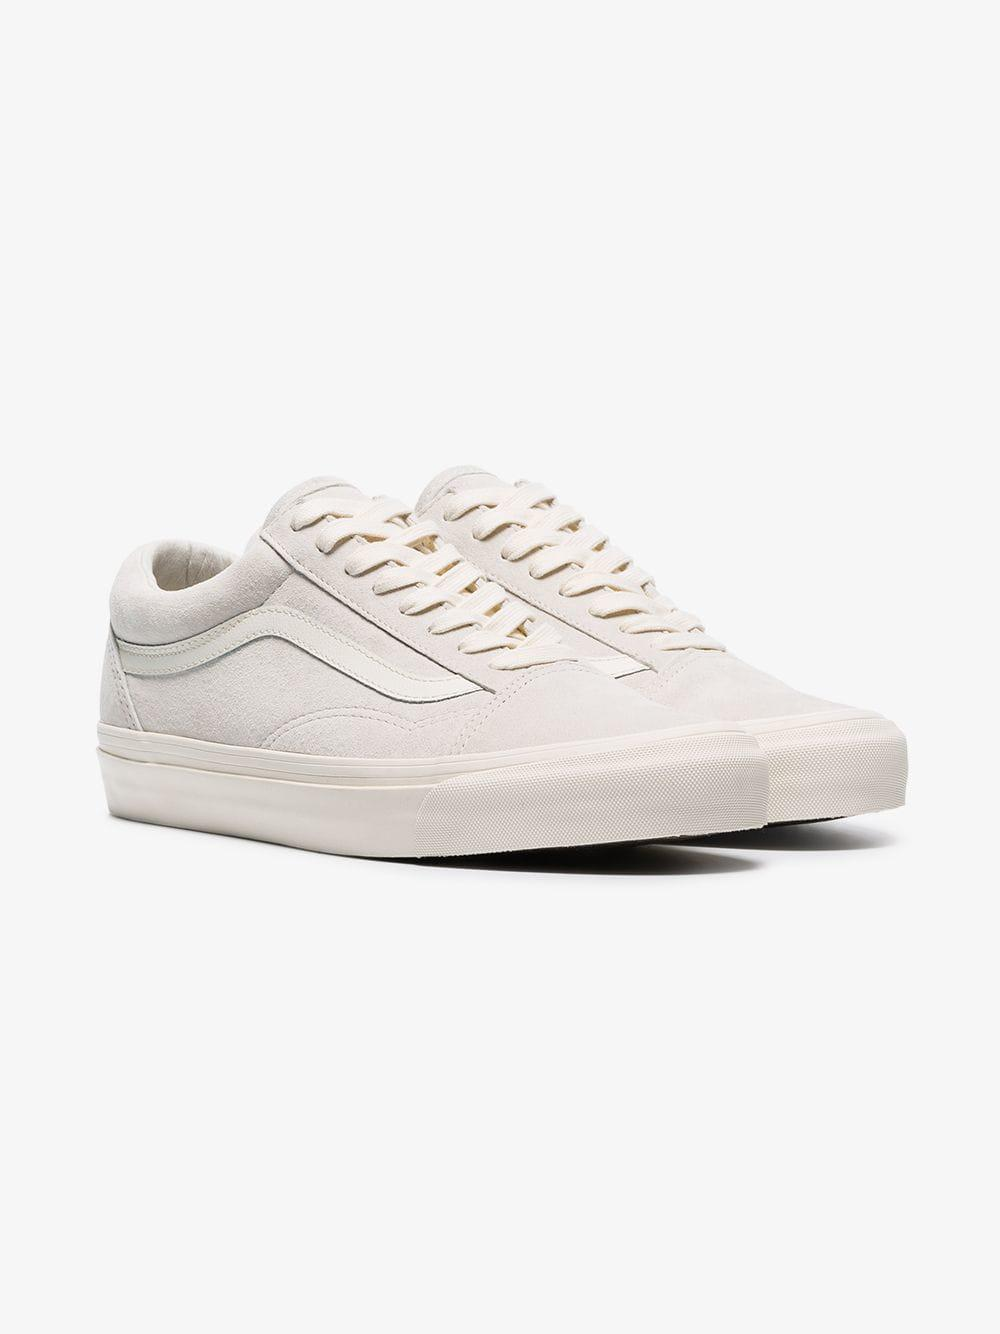 b1565f8865 Lyst - Vans Grey Vault Suede Low Top Sneakers in White for Men - Save 3%